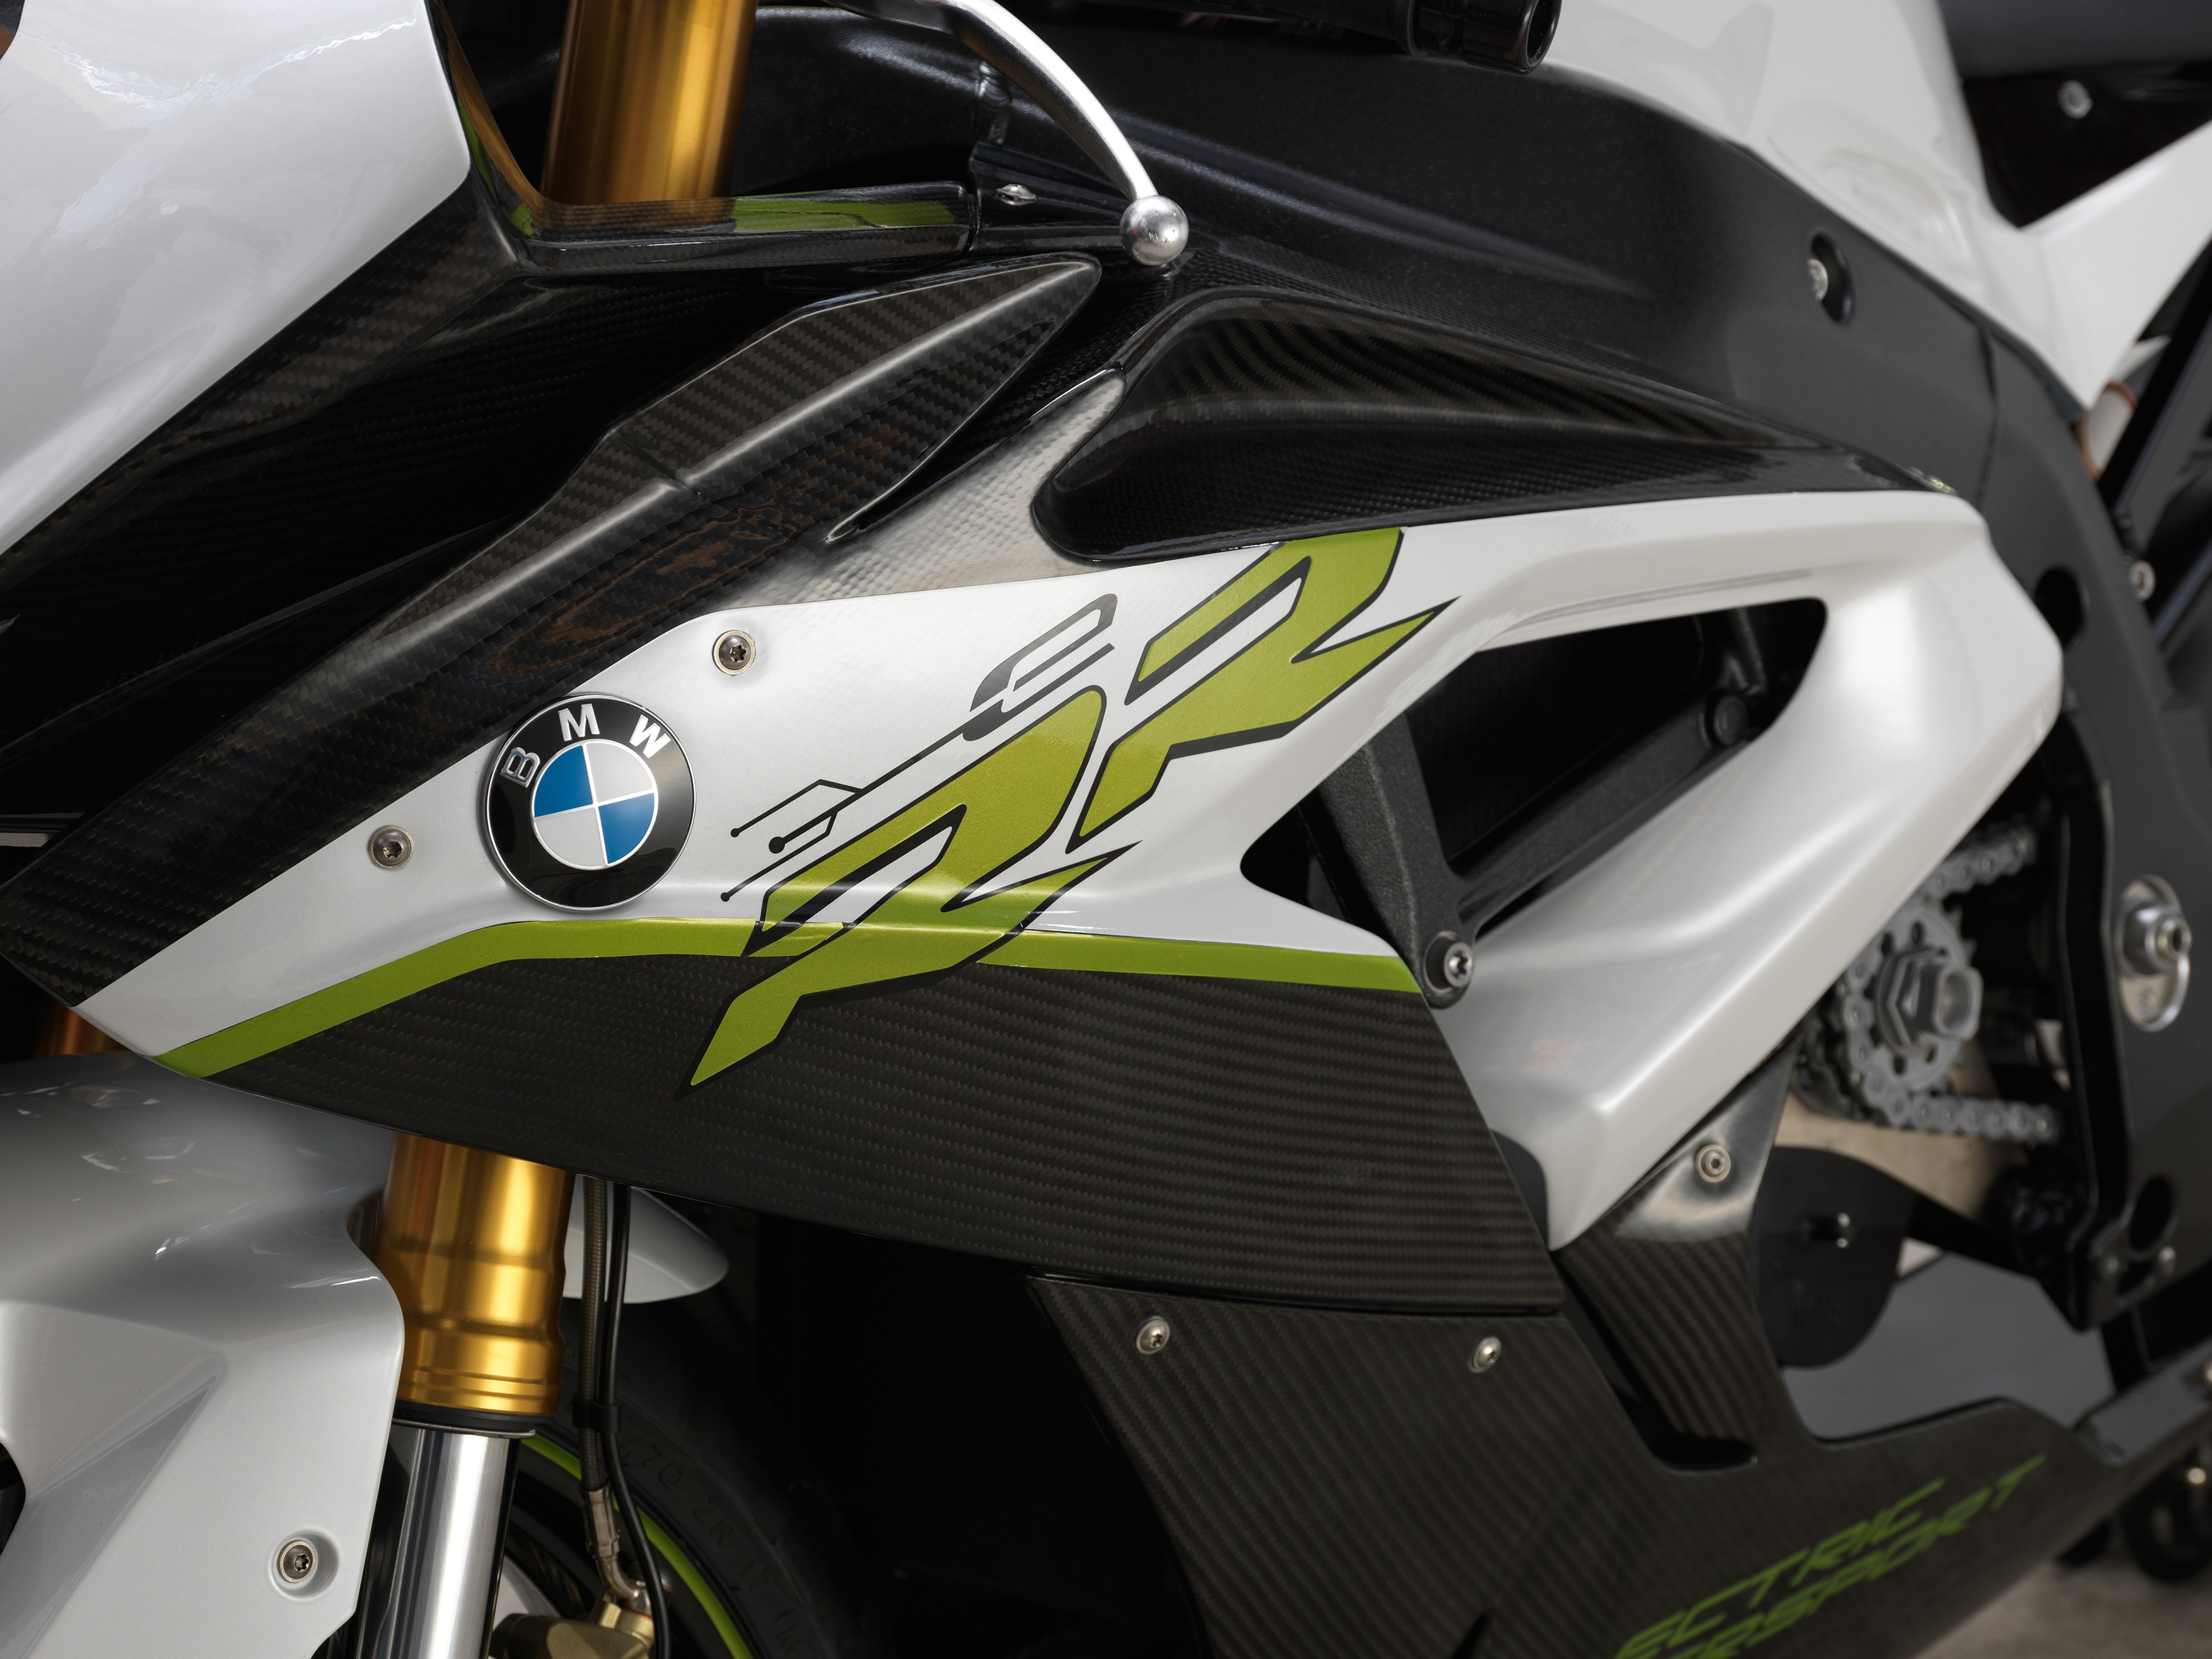 BMW eRR show